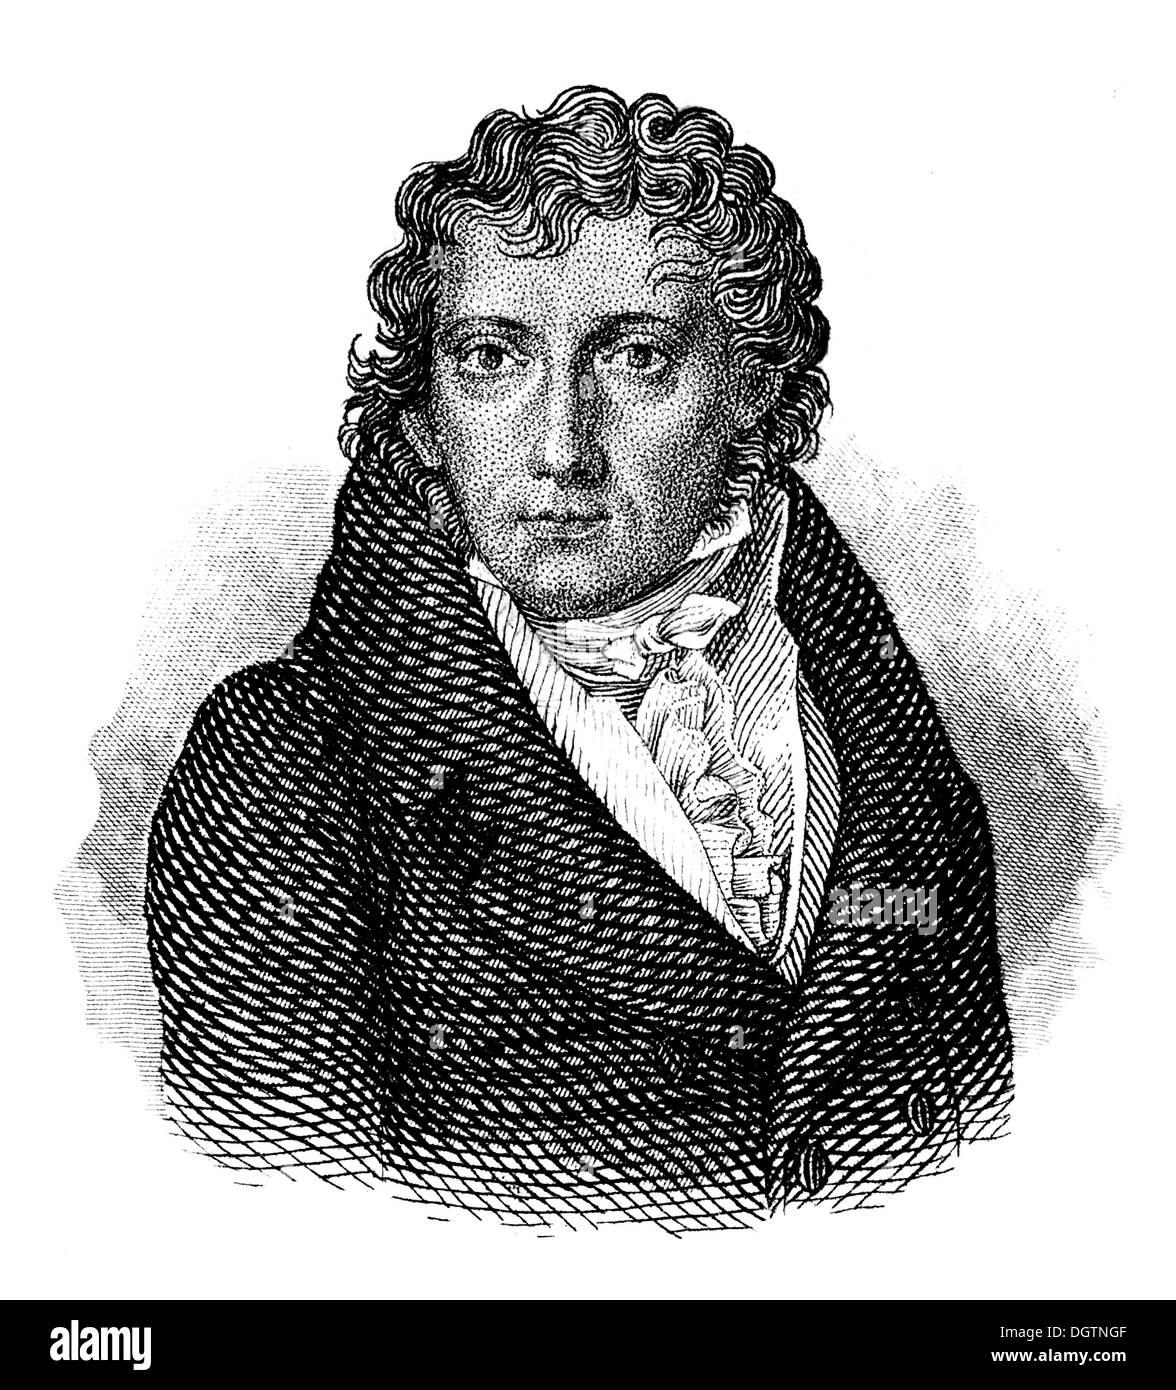 Friedrich Daniel Ernst Schleiermacher, 1768 - 1834, a Protestant theologian, classical scholar, philosopher, writer, - Stock Image